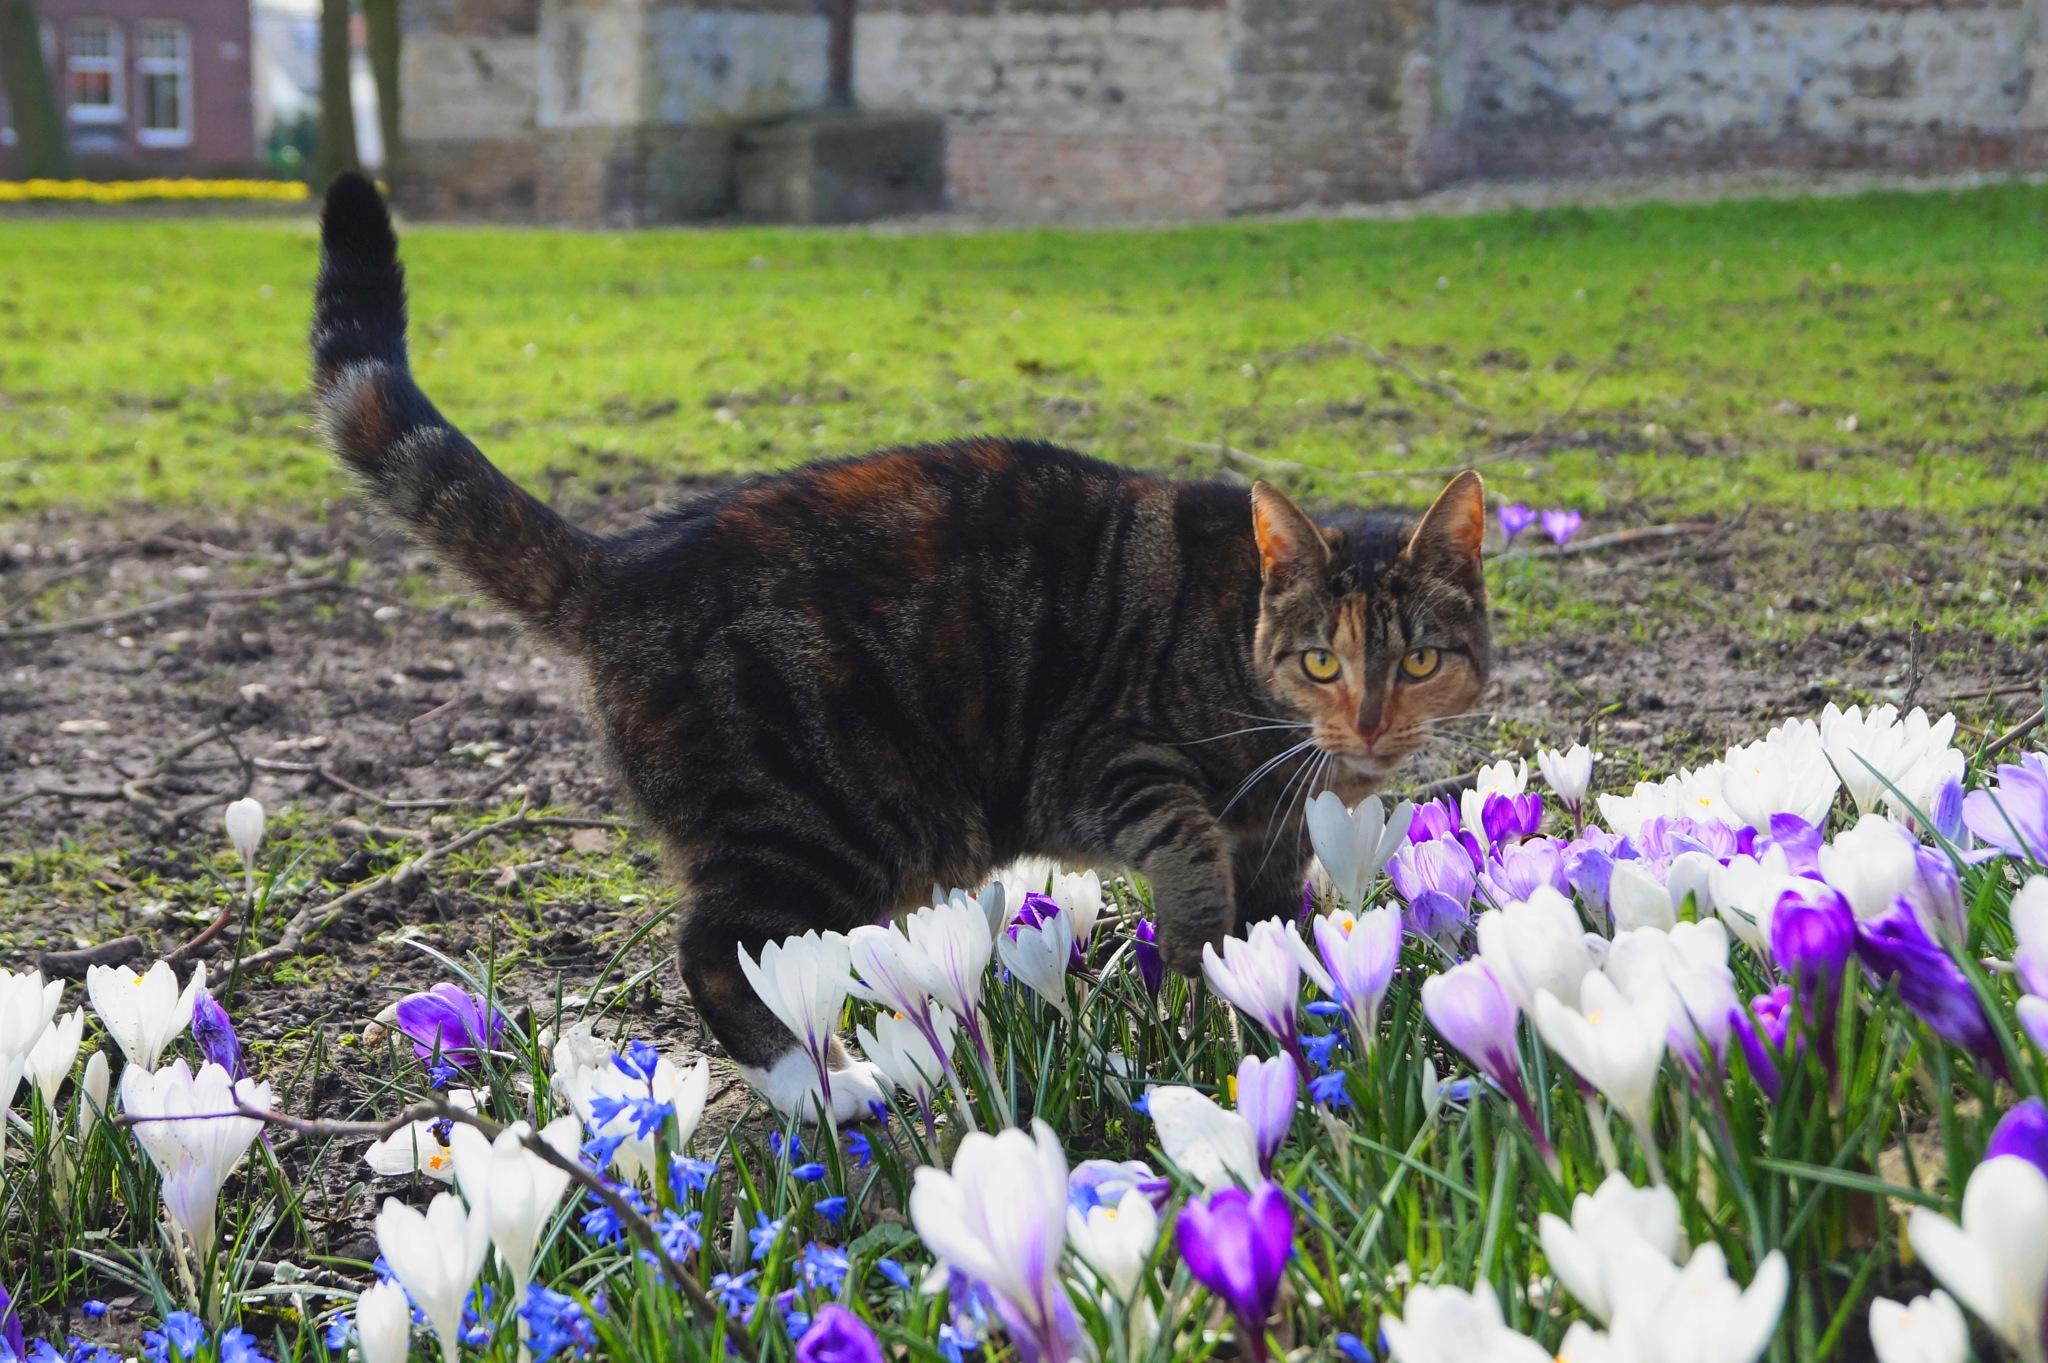 Curious Cat by Marian Baay